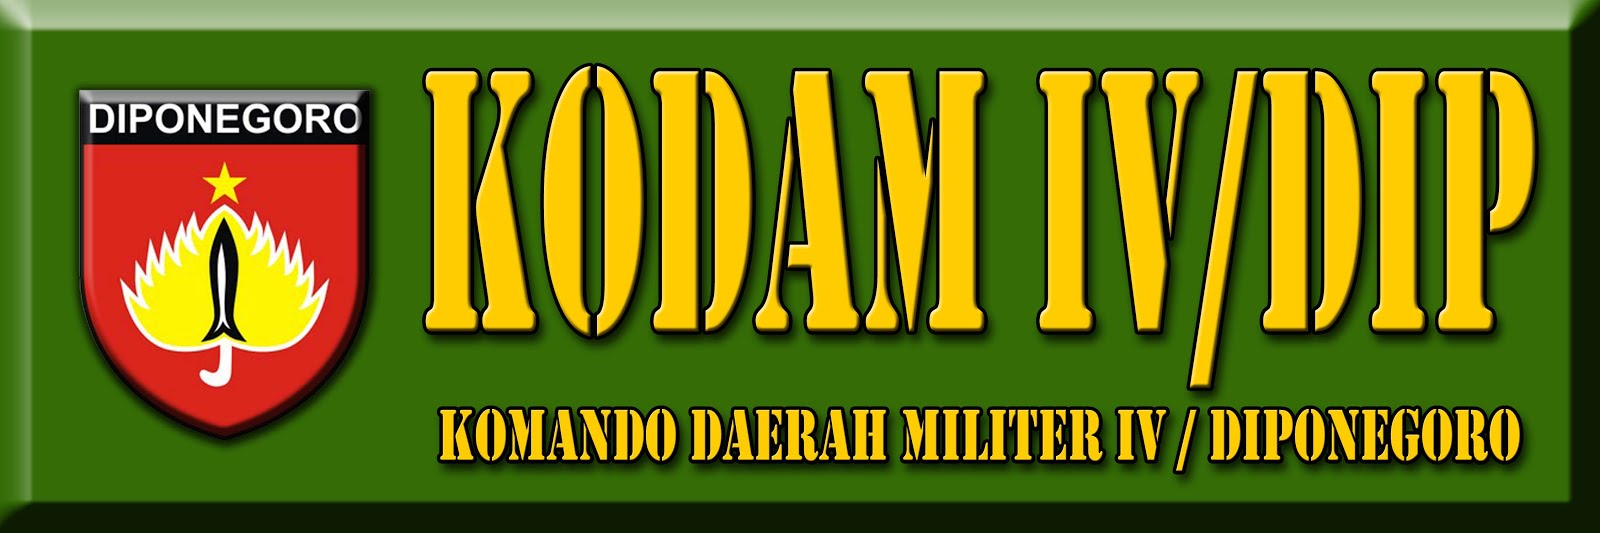 KODAM IV/DIP